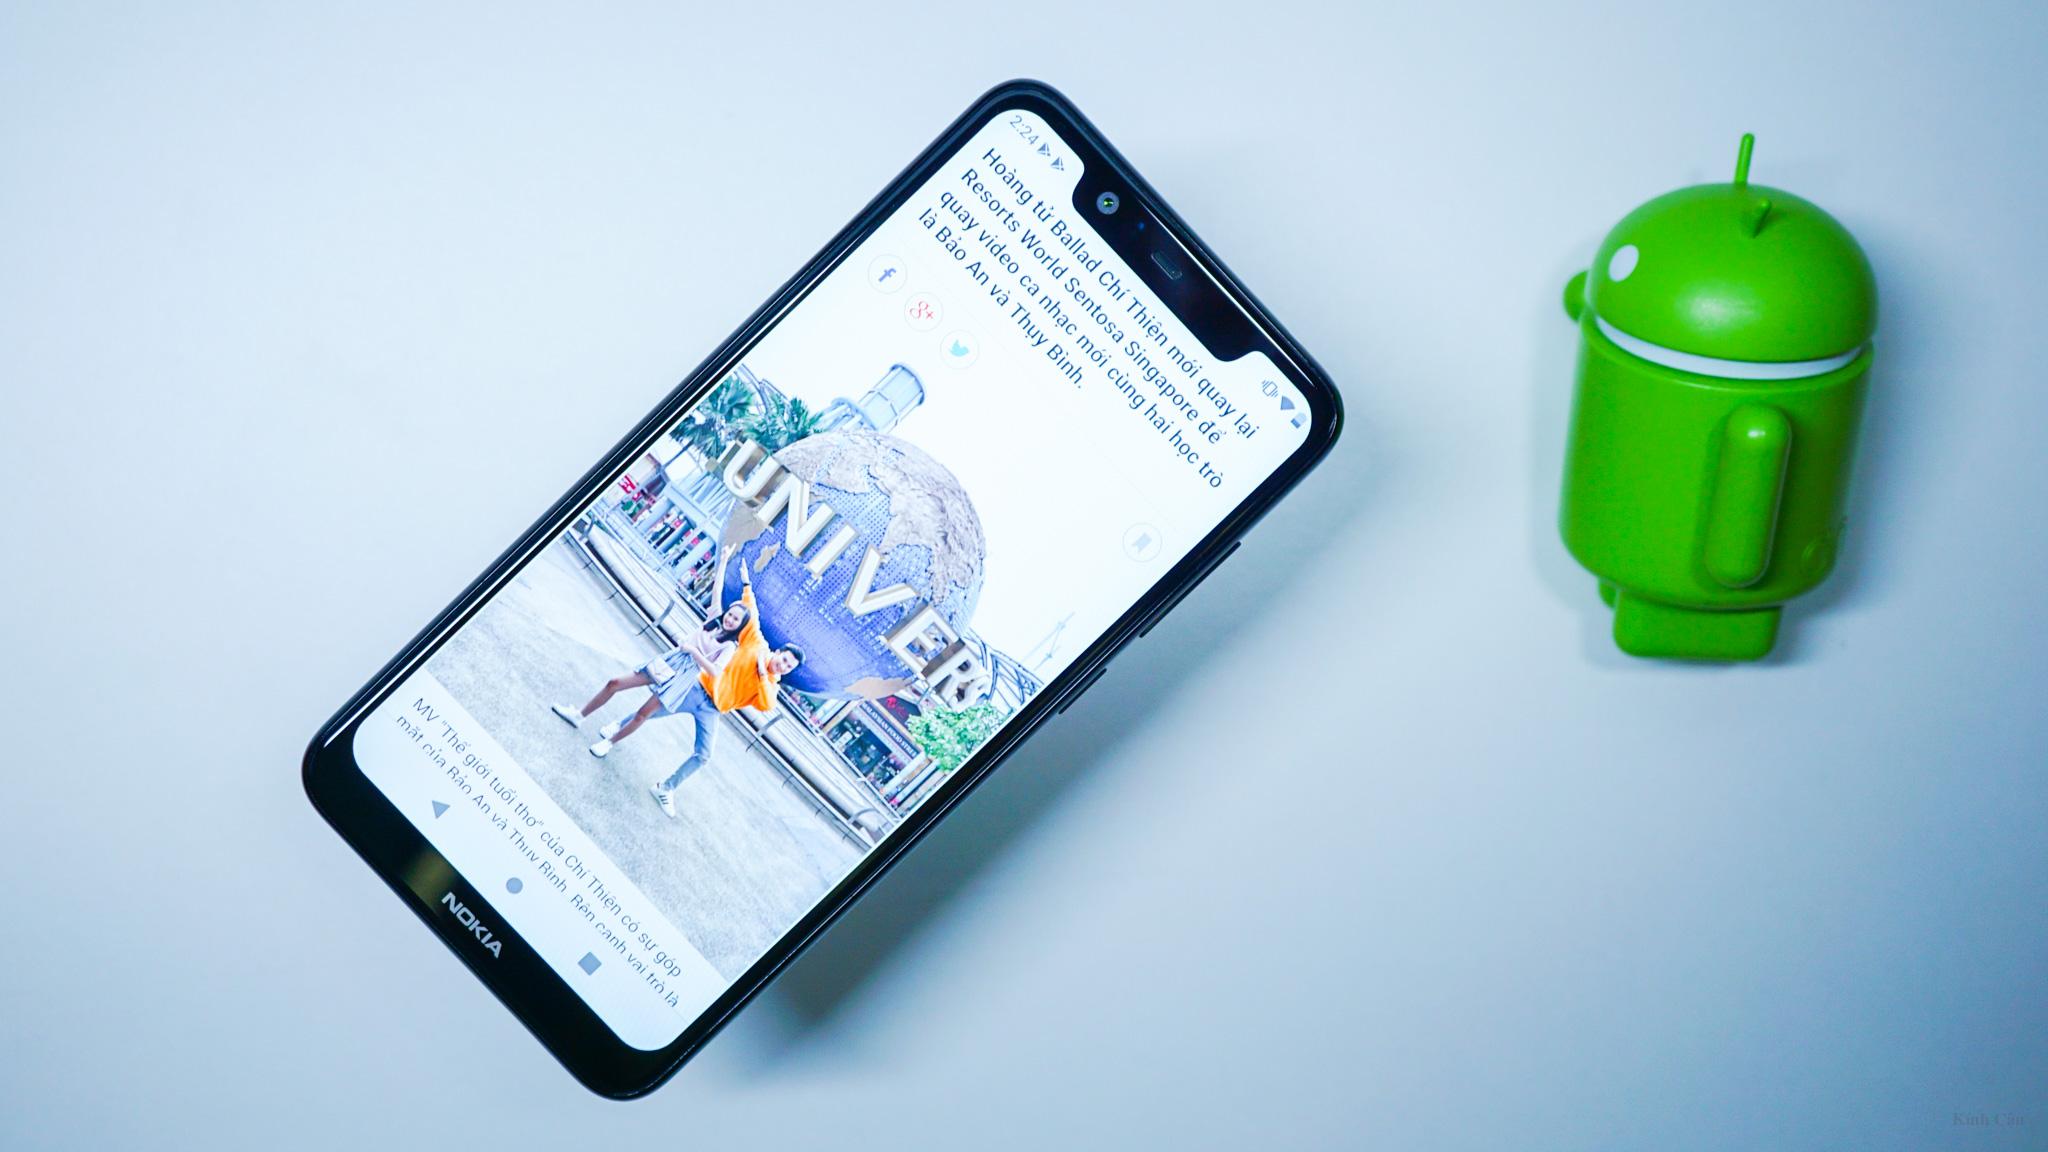 Nokia 5.1 Plus và Nokia 6.1 Plus lên Android 9 Pie_-2.jpg